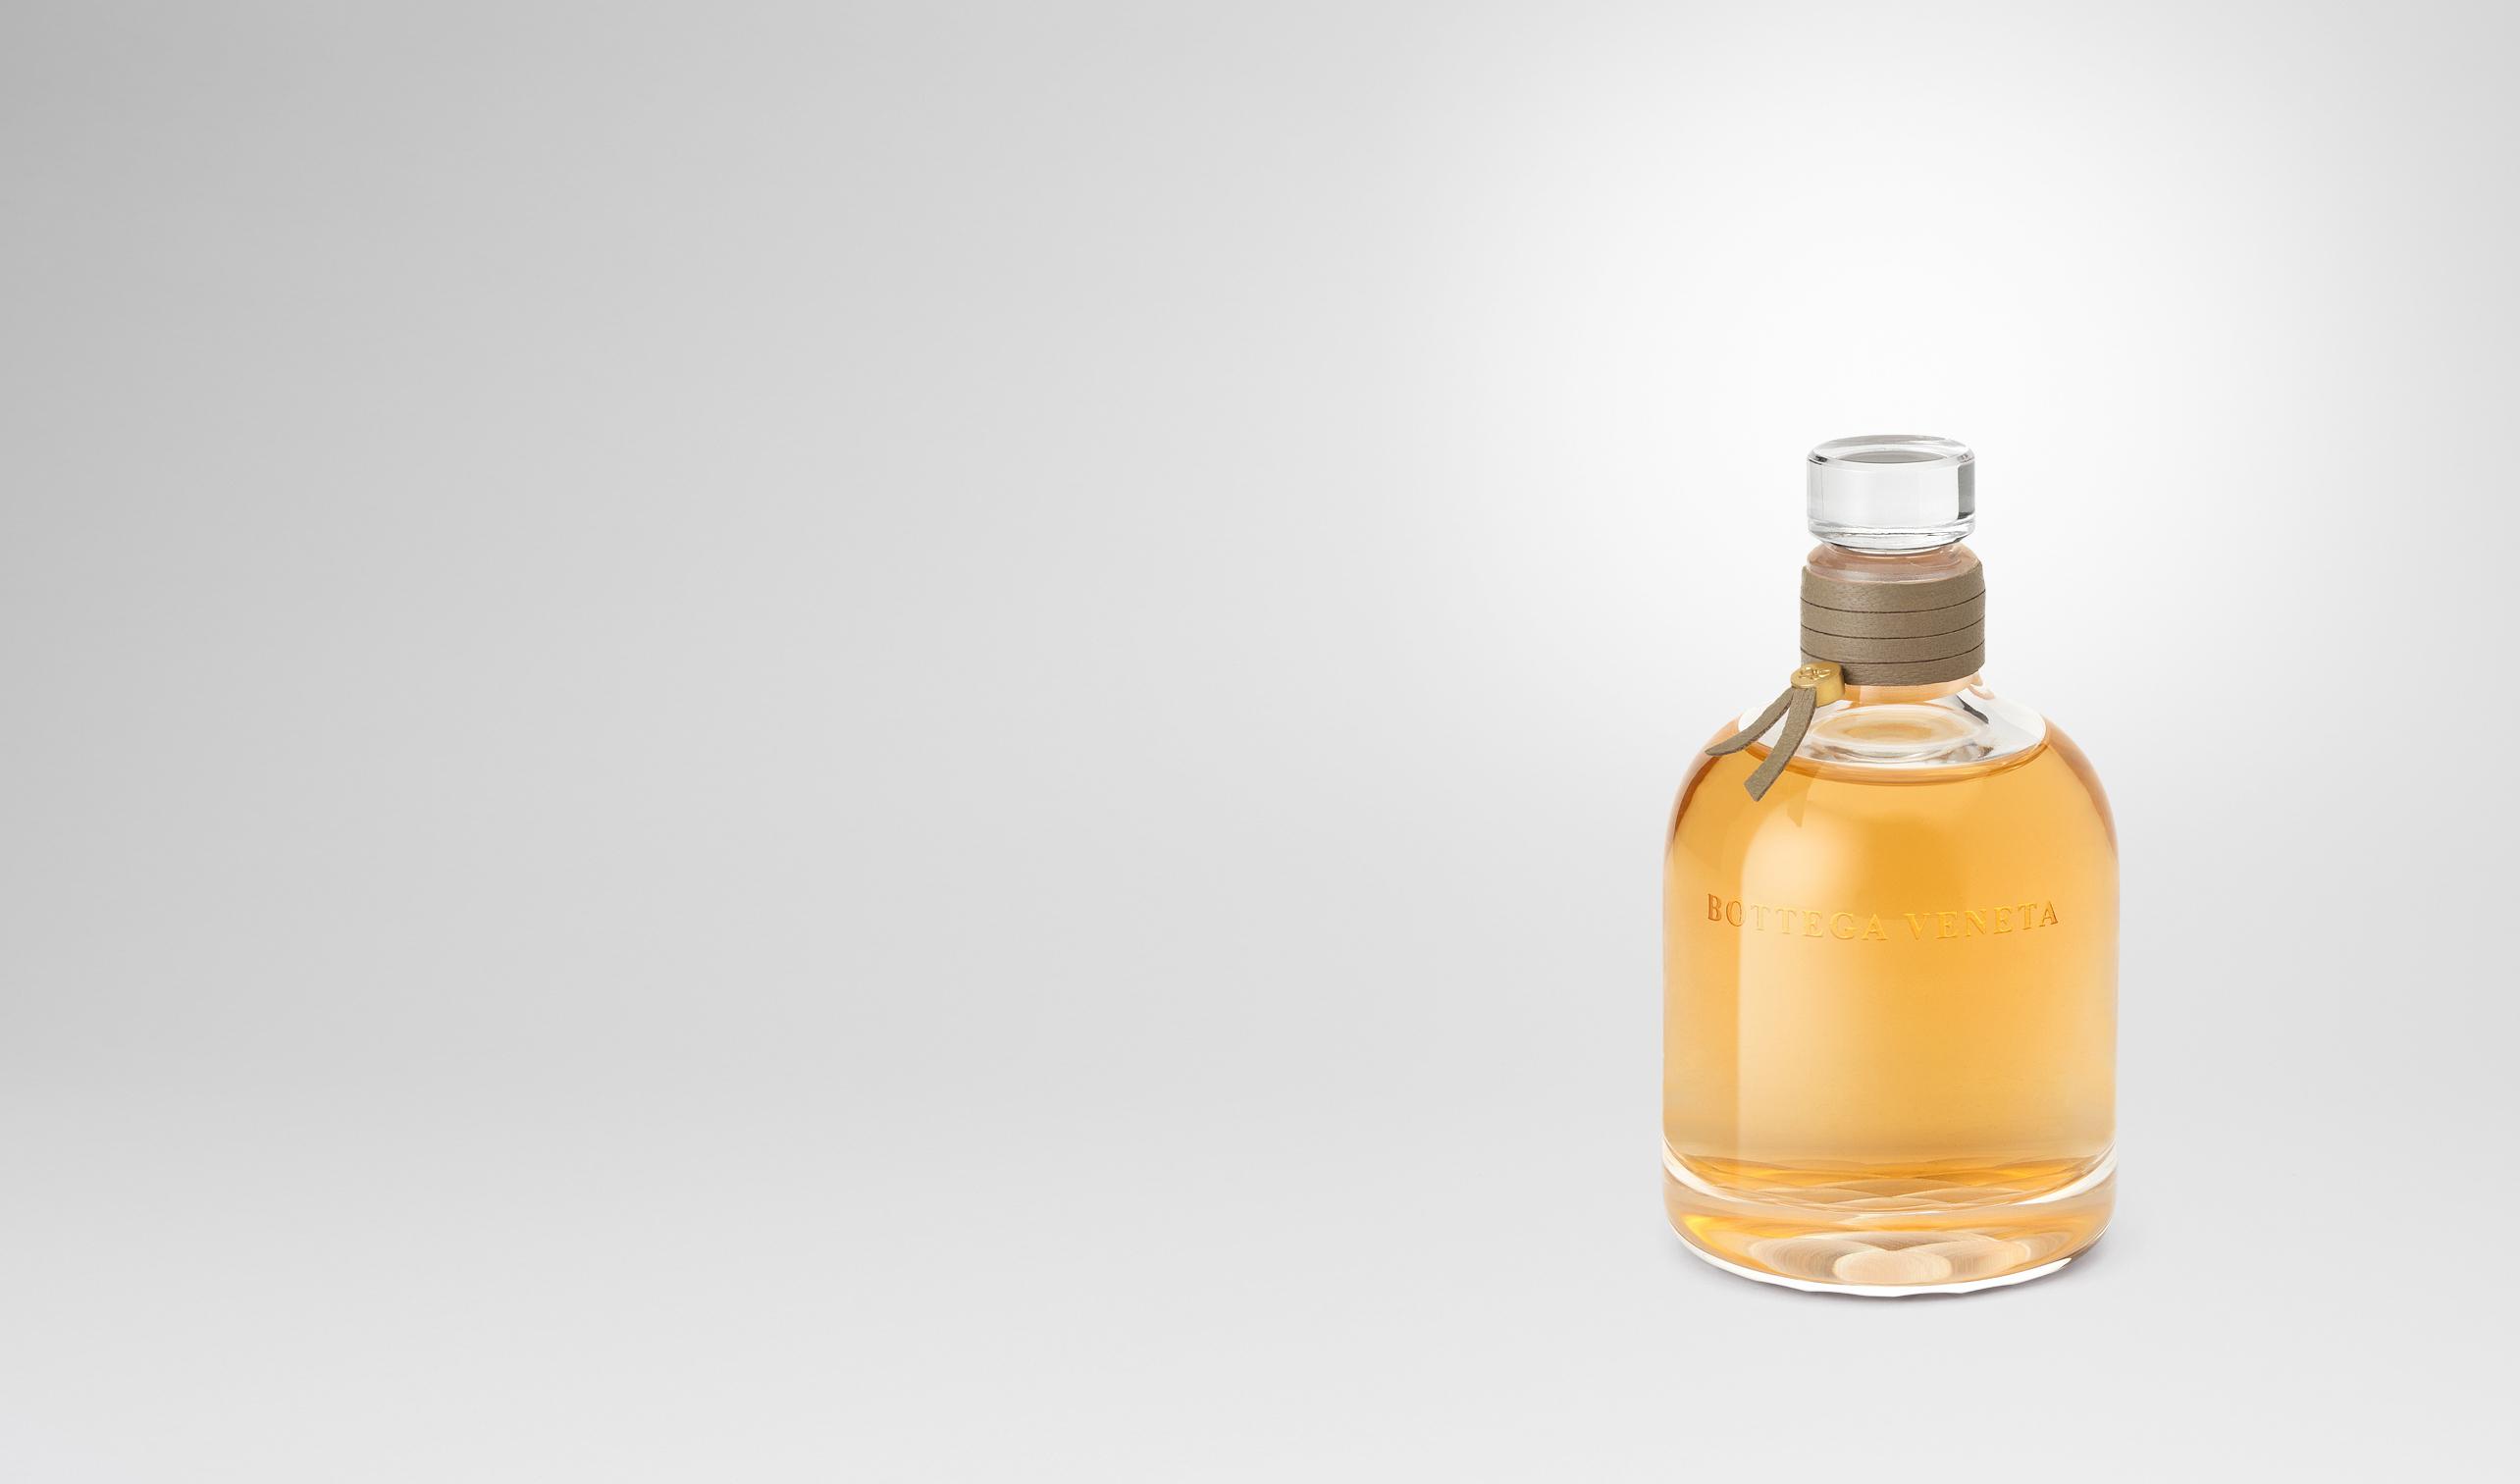 BOTTEGA VENETA Fragrance D Bottega Veneta Murano Parfum 50ml pl